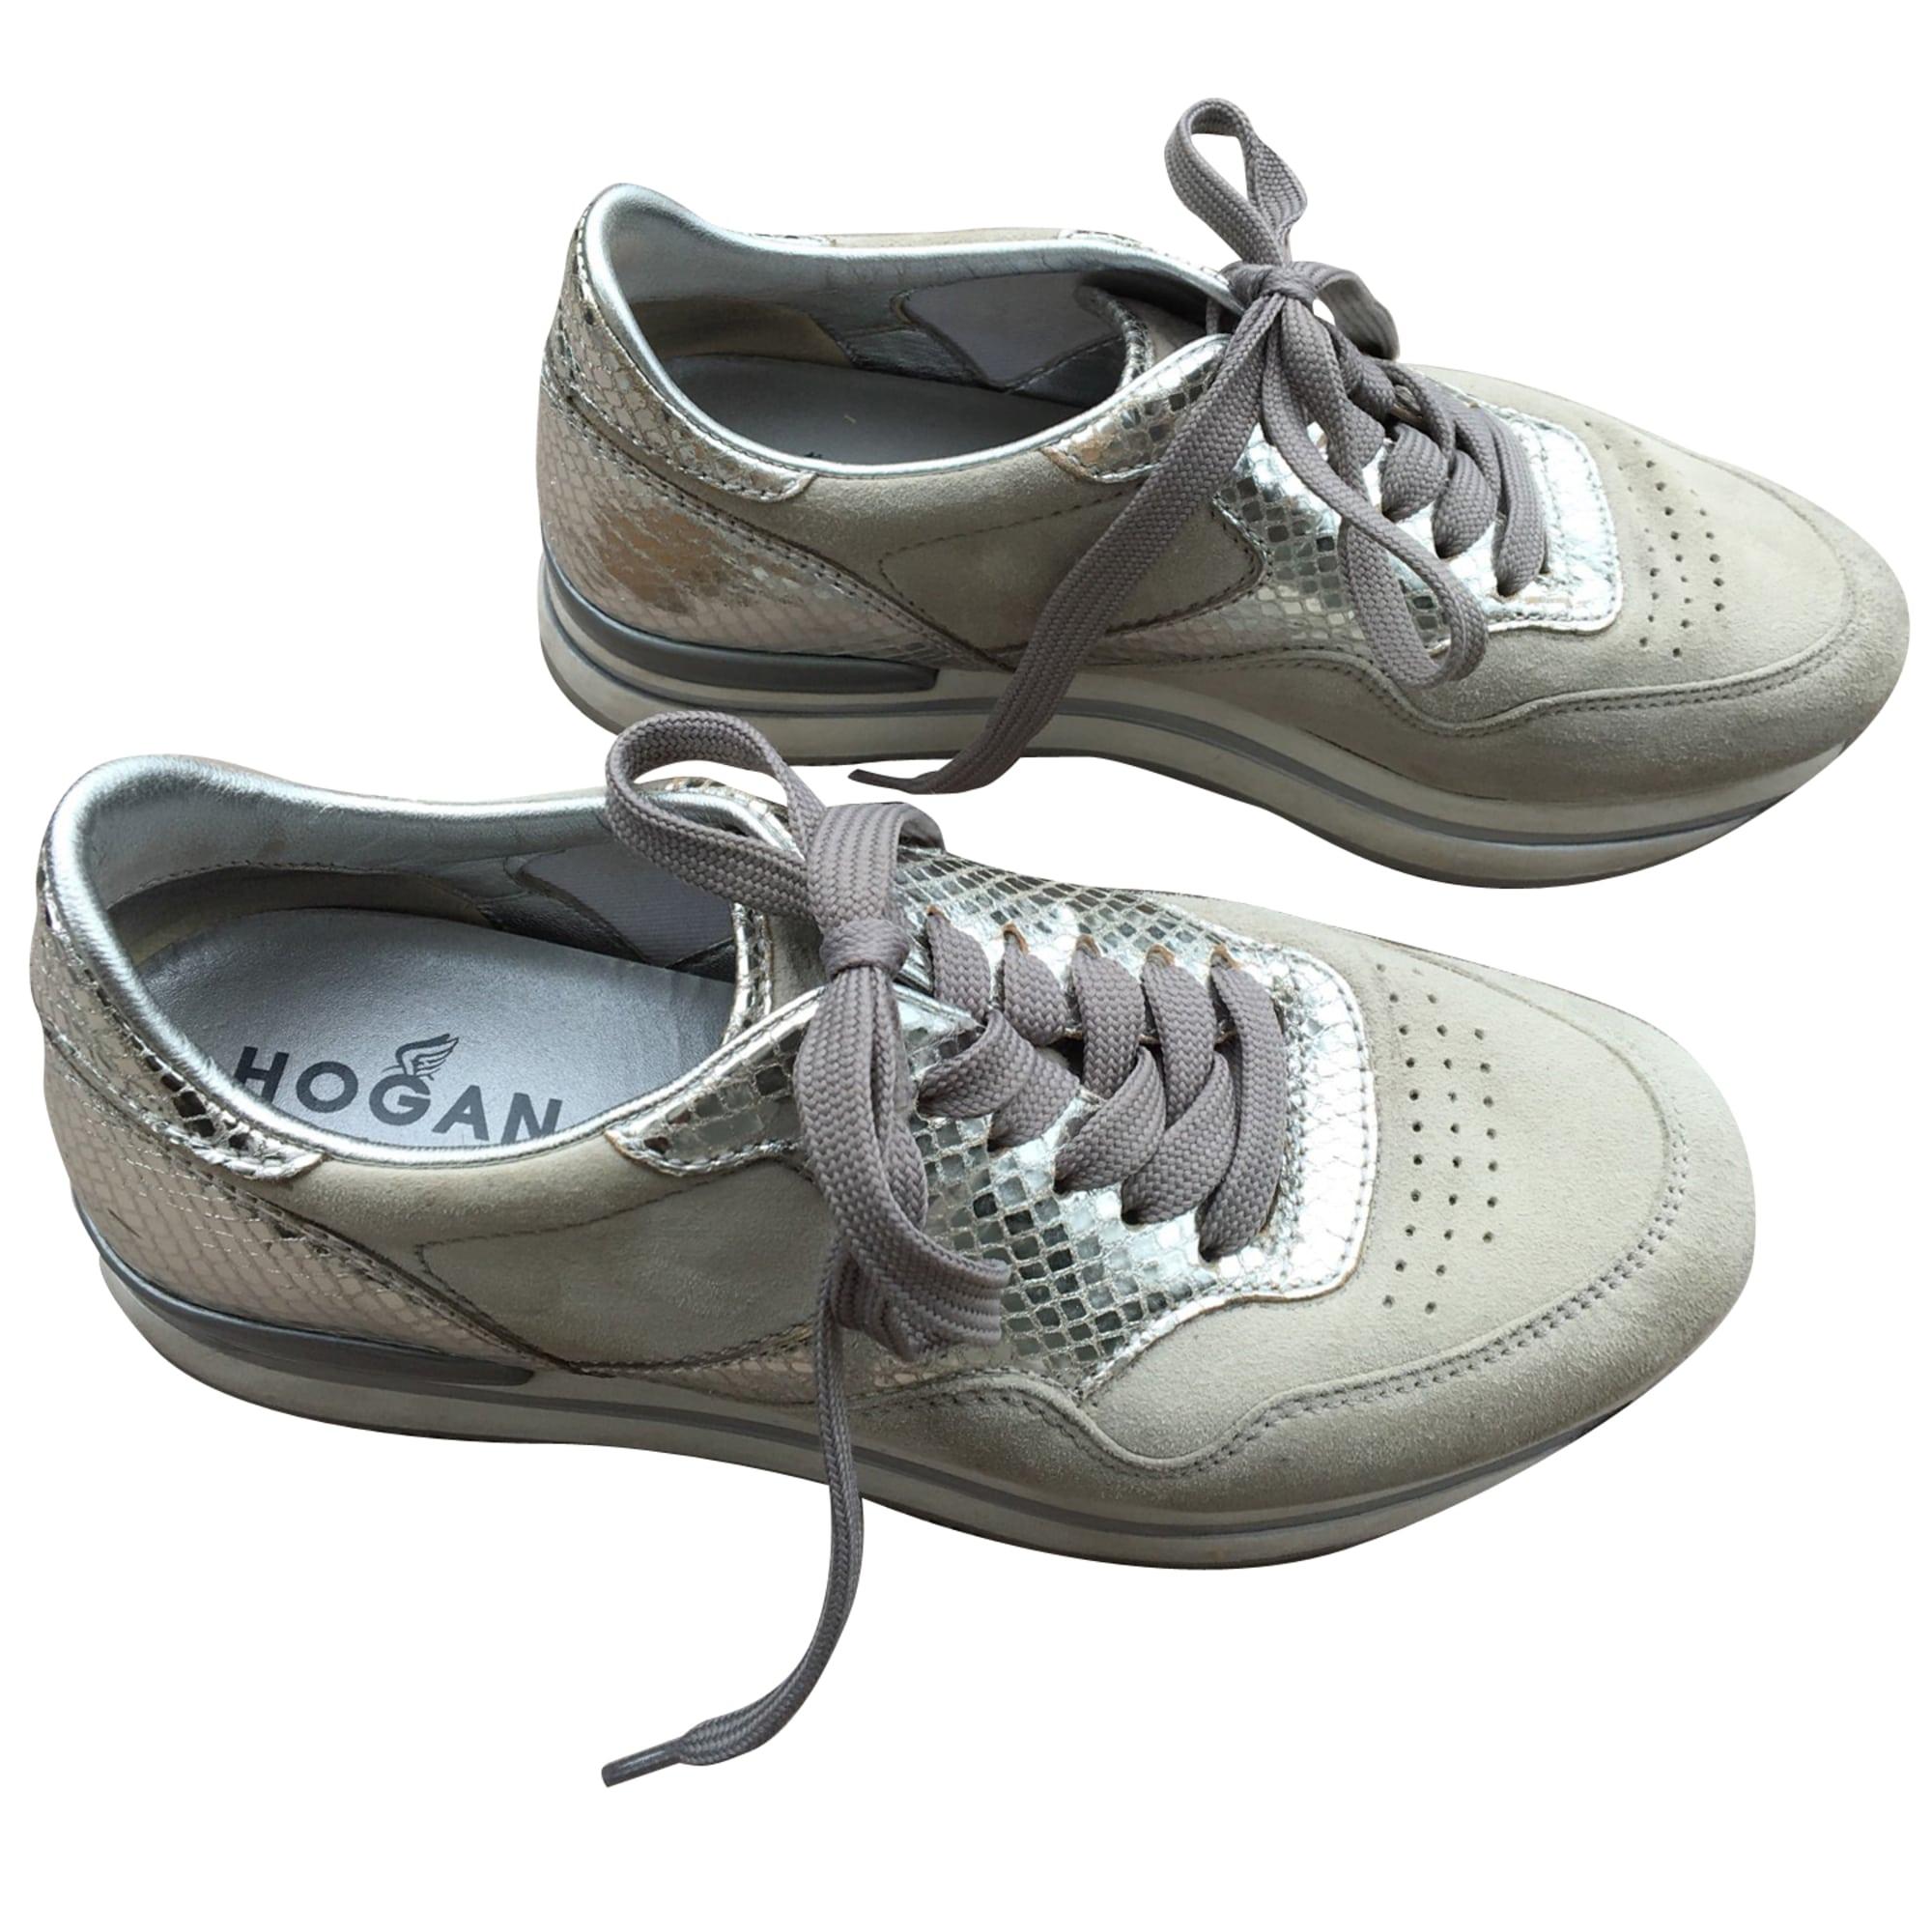 f60ce72858c184 Baskets HOGAN 38 gris - 7986274